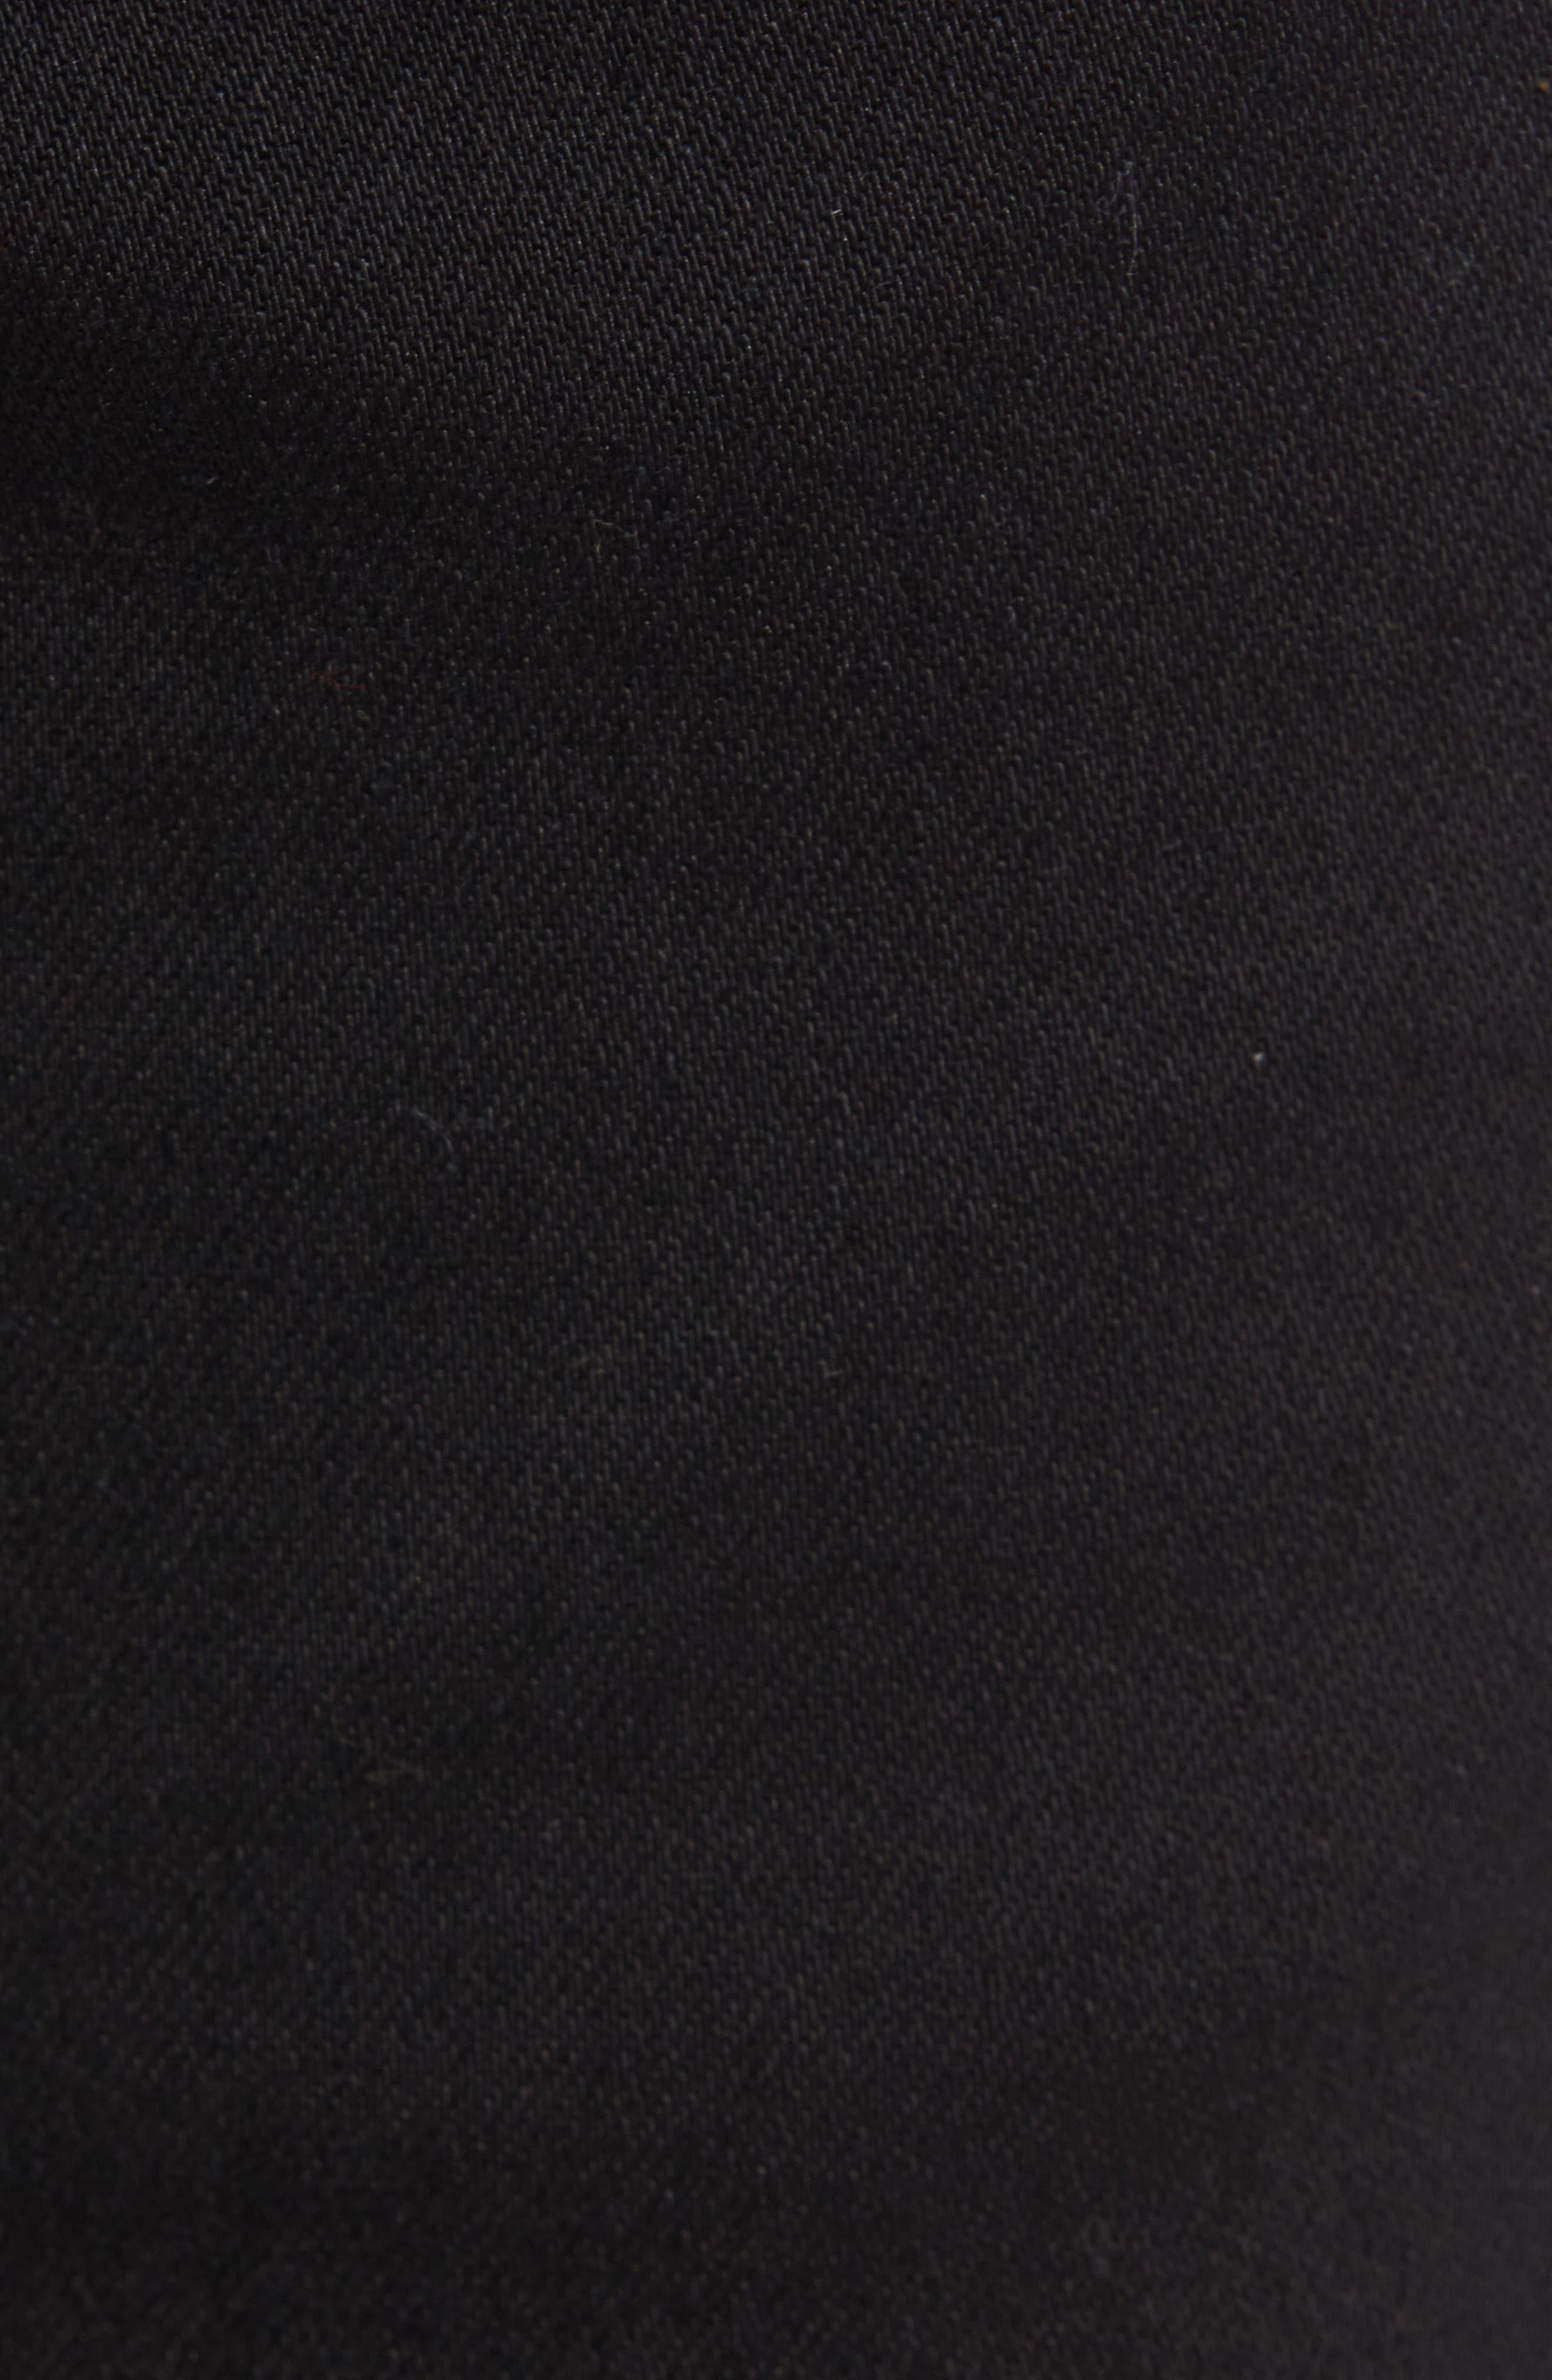 Destroyer Ripped Slim Fit Jeans,                             Alternate thumbnail 5, color,                             BLACK